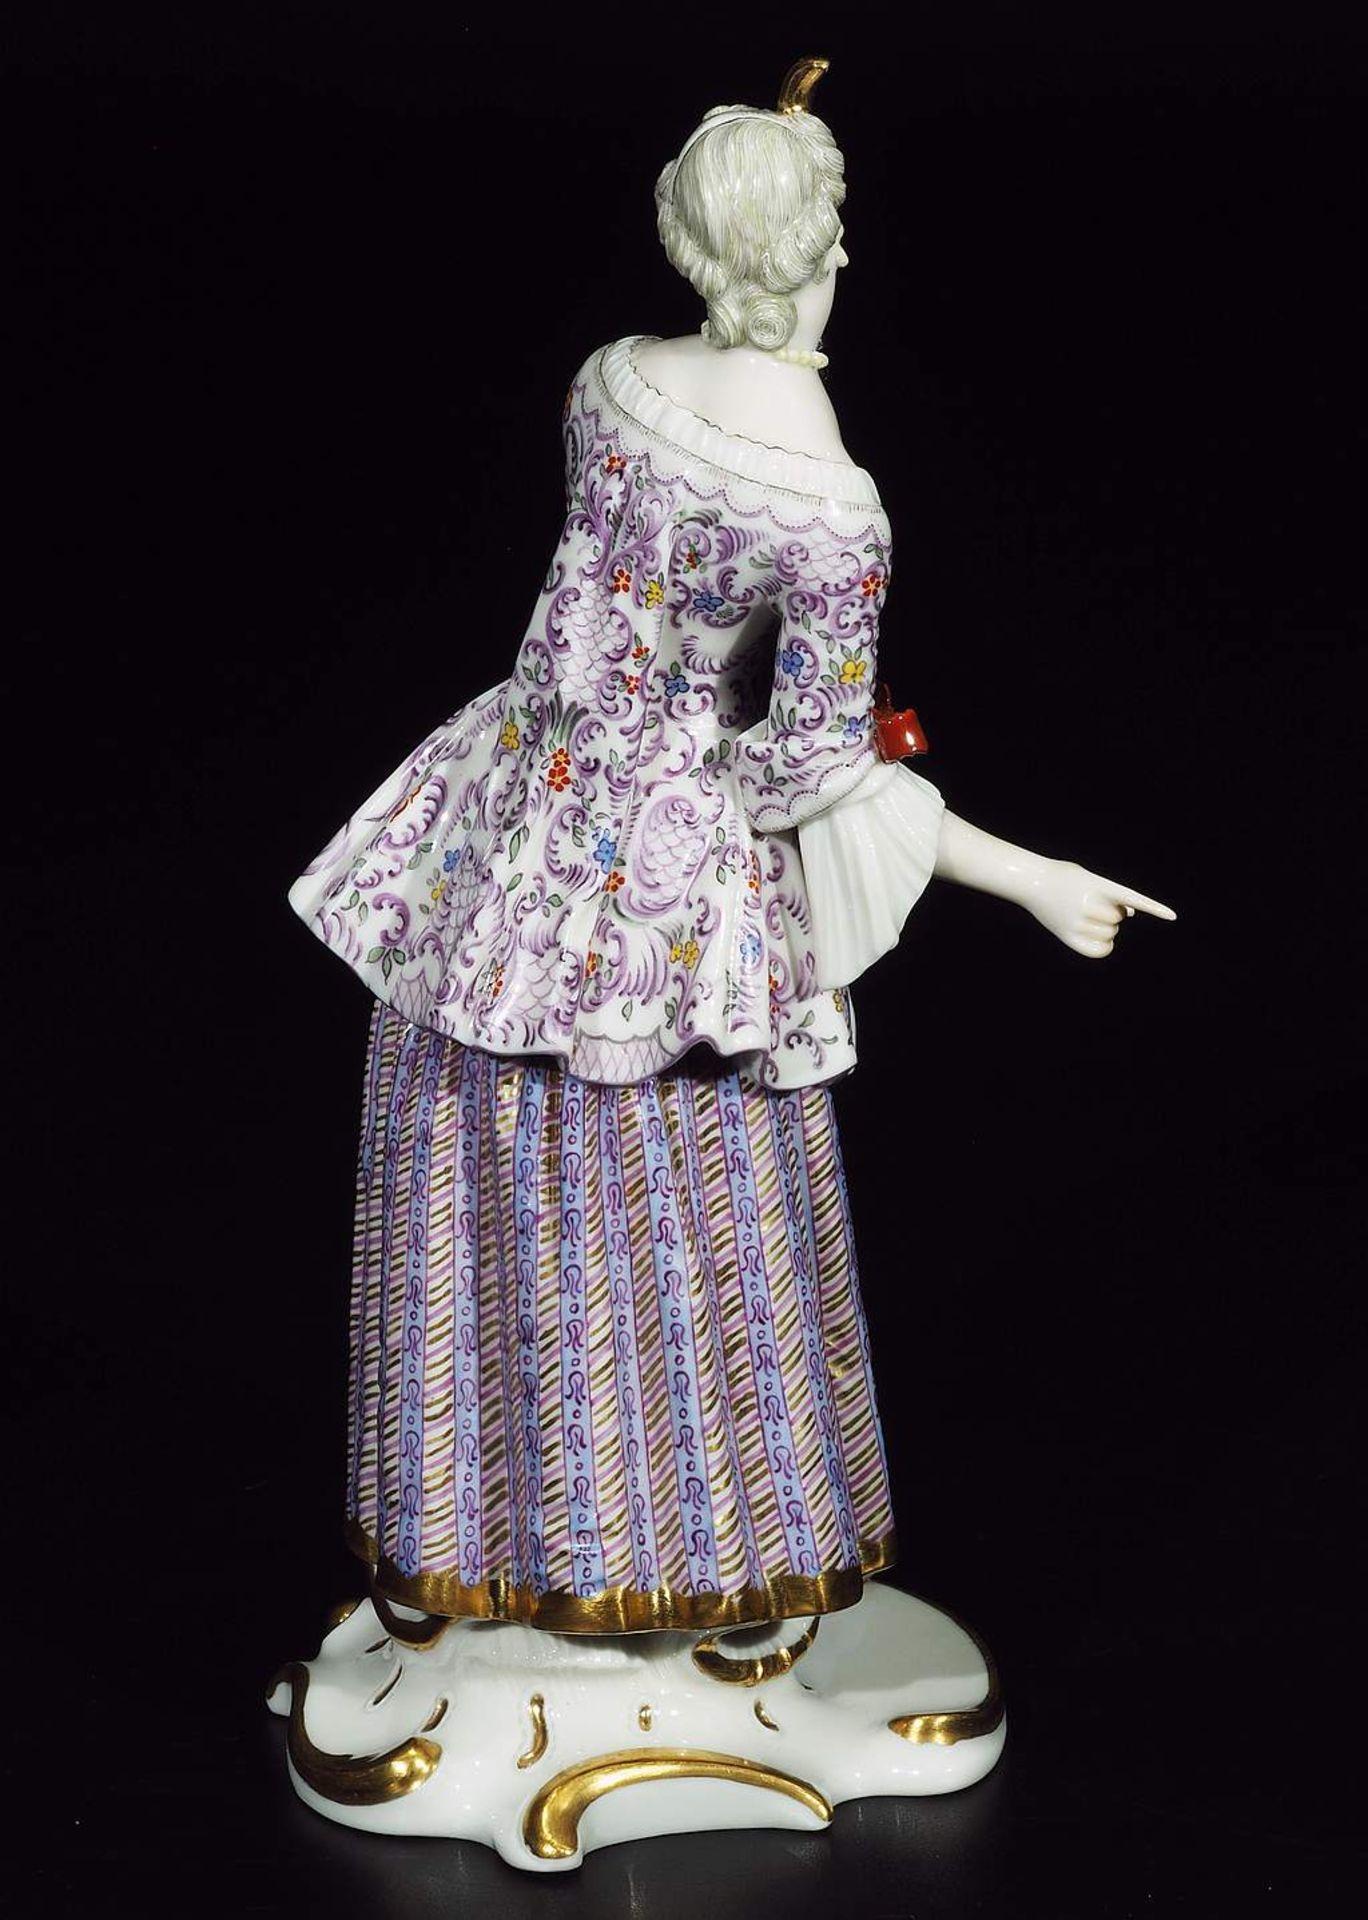 LUCINDA, Figurine der Commedia dell'Arte, NYMPHENBURG, Jahrhundert. - Image 5 of 8